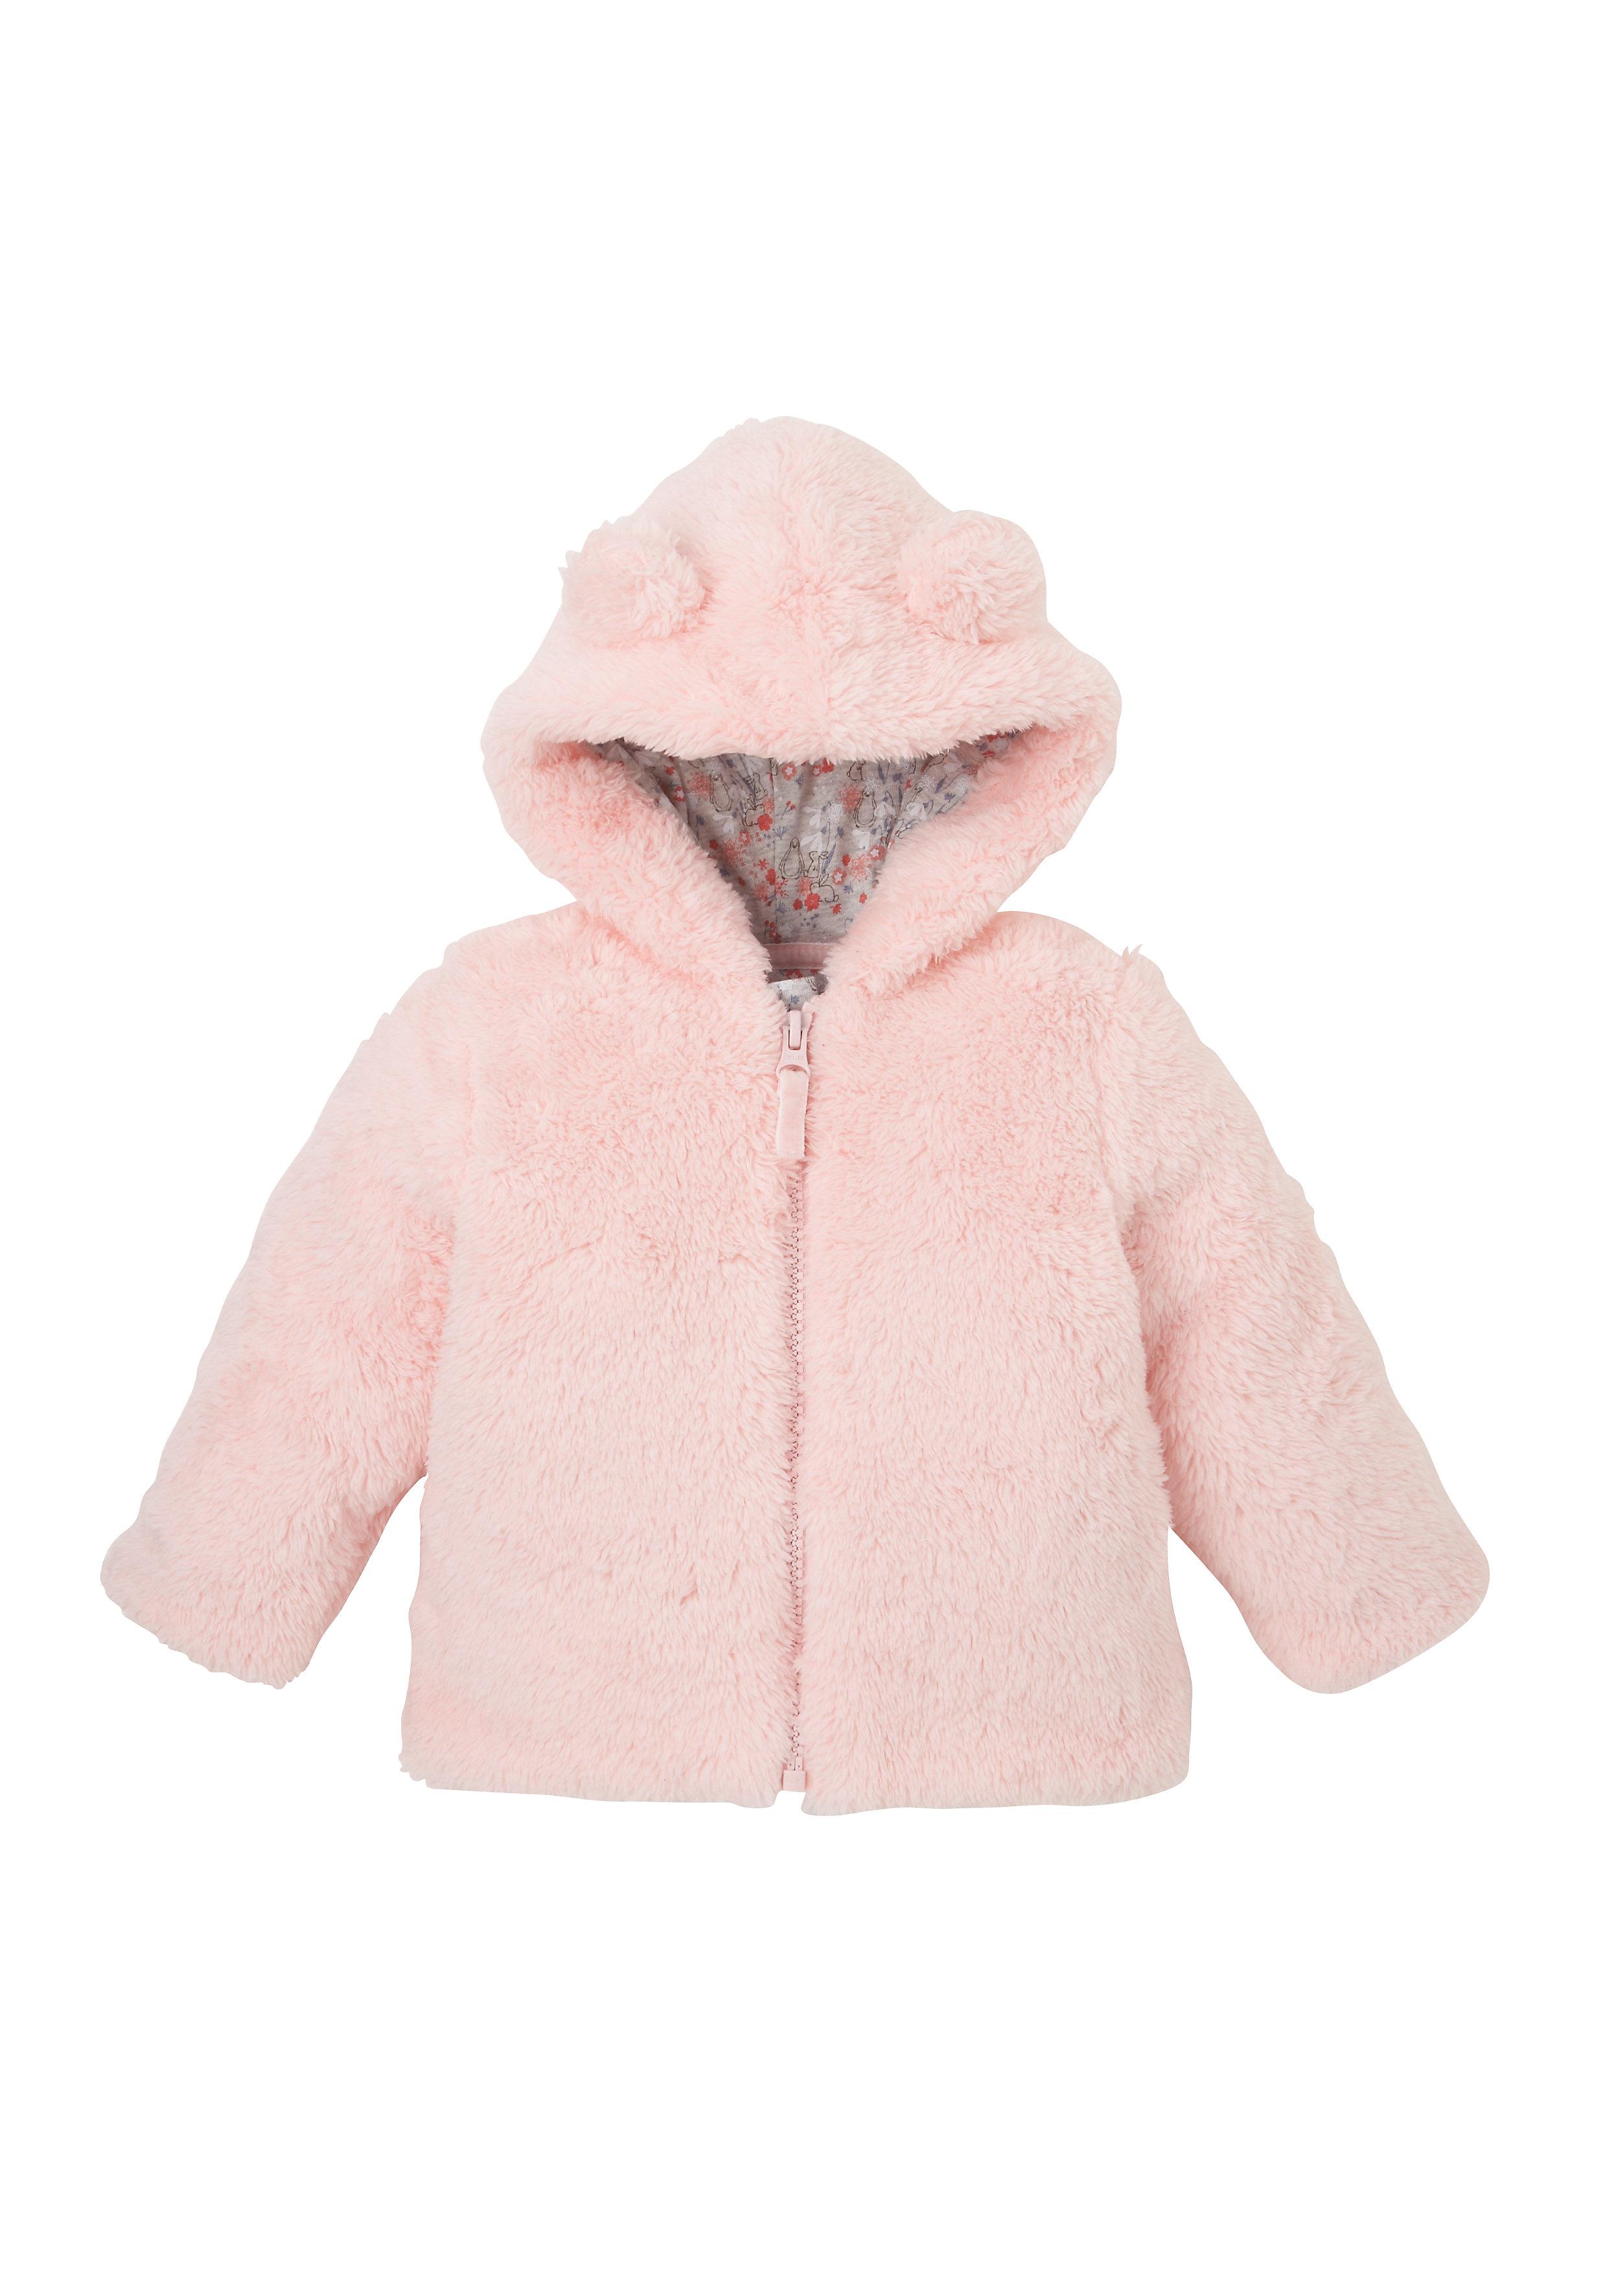 Mothercare | Girls Full Sleeves Jackets Hooded Fleece - Pink